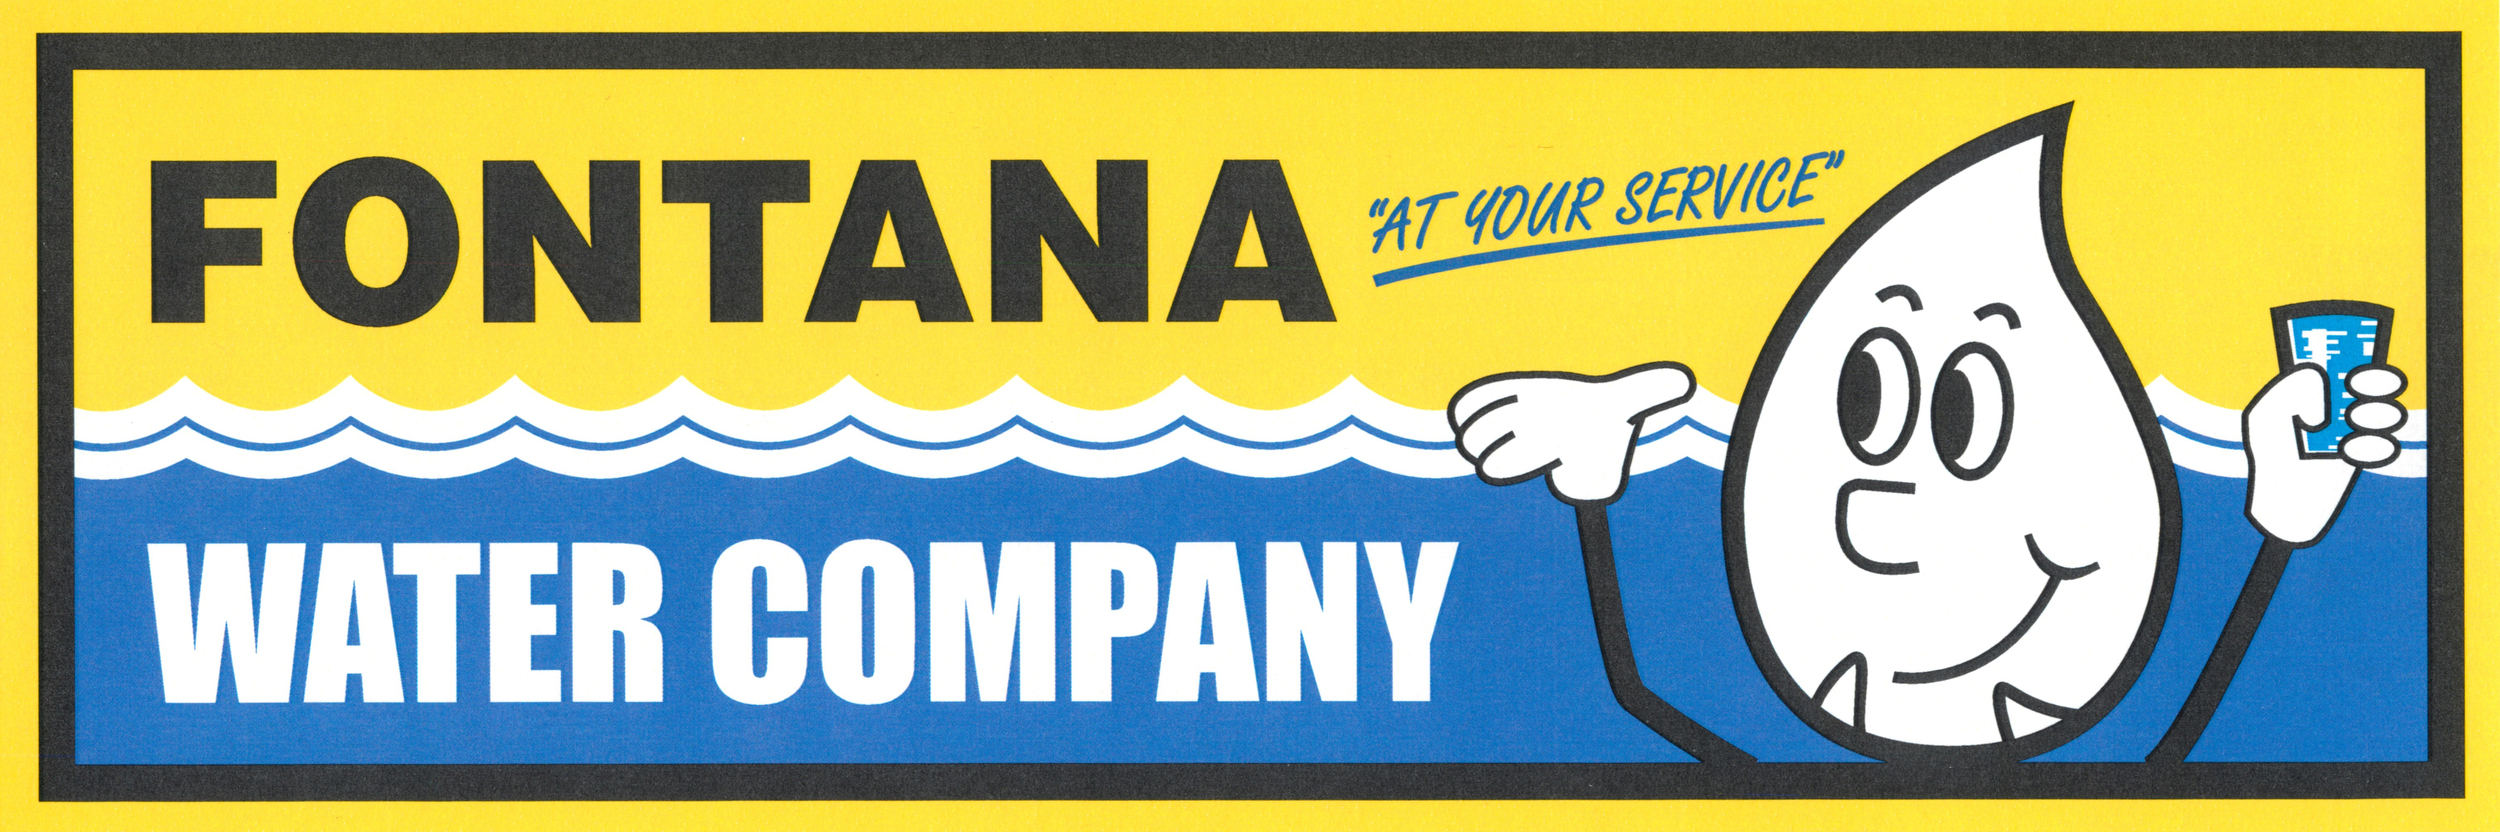 Fontana Water Company.jpg